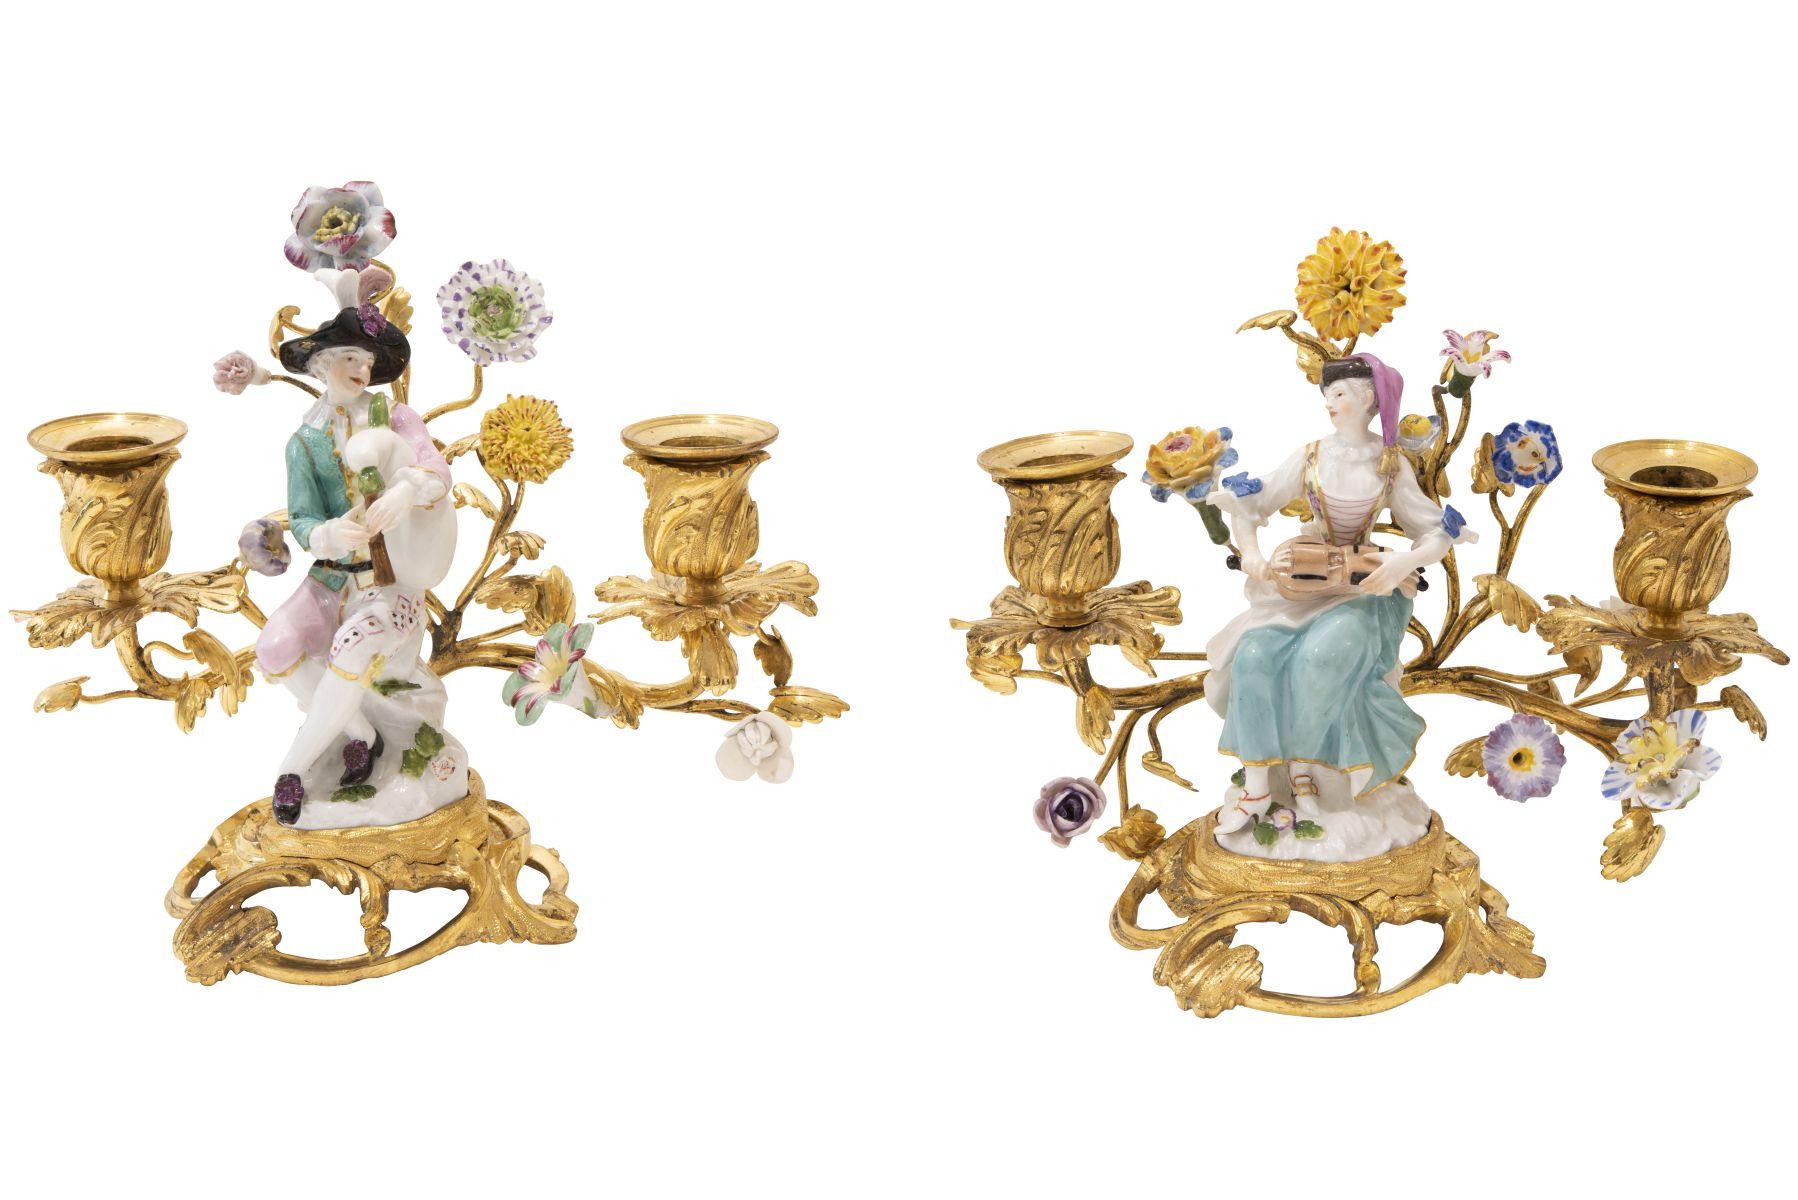 #98 Pair of Figural Girandols, Meissen ca. 1750 | Paar figurale Girandolen, Meissen um 1750 Image